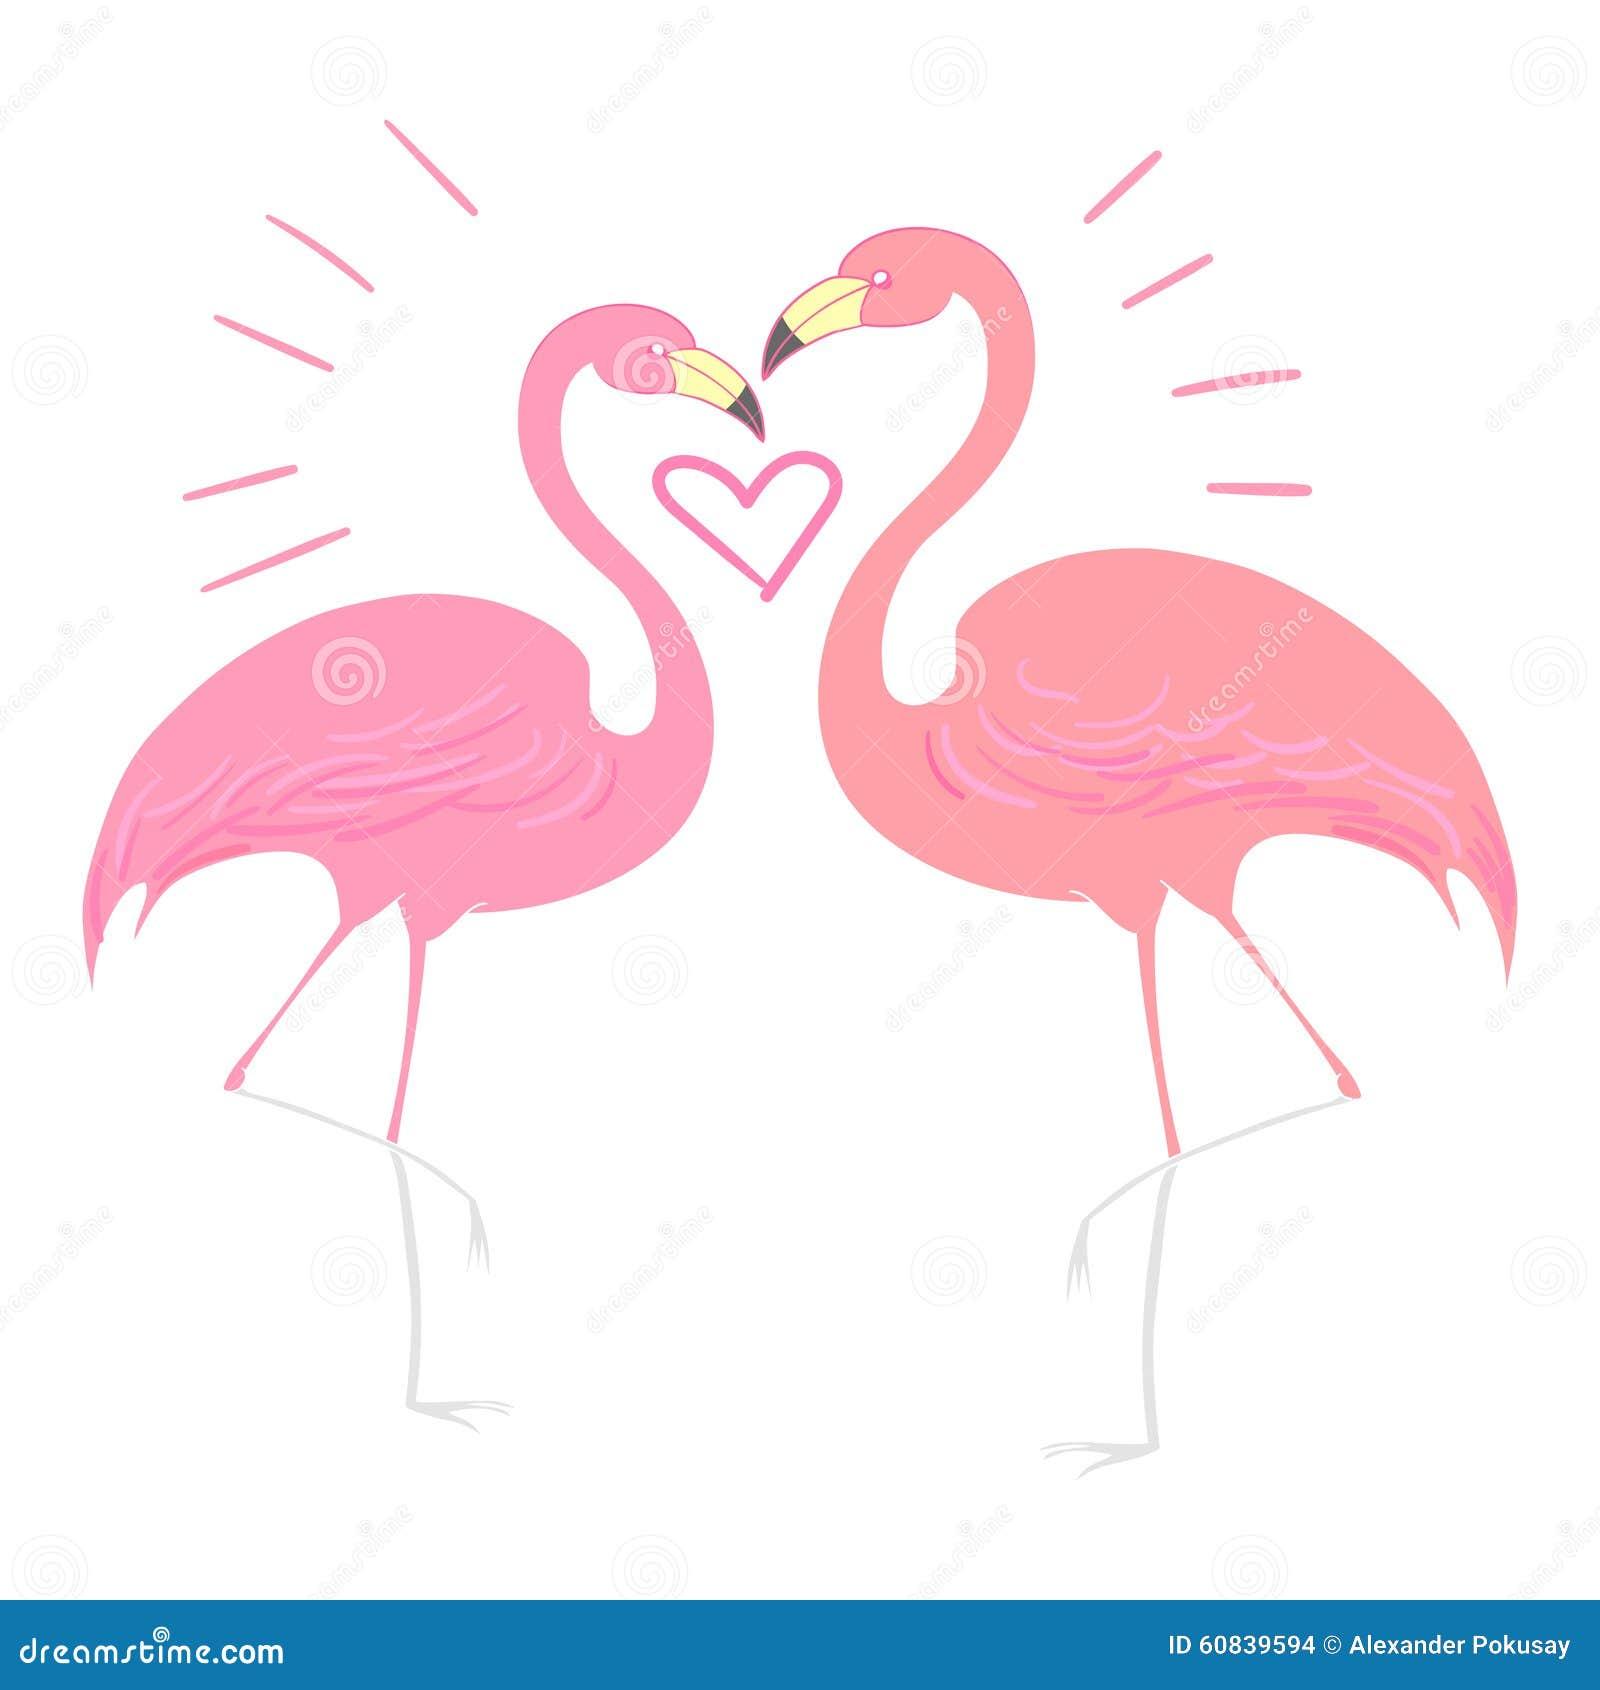 Flamingo Bird With Heart Vector Illustration Stock Vector